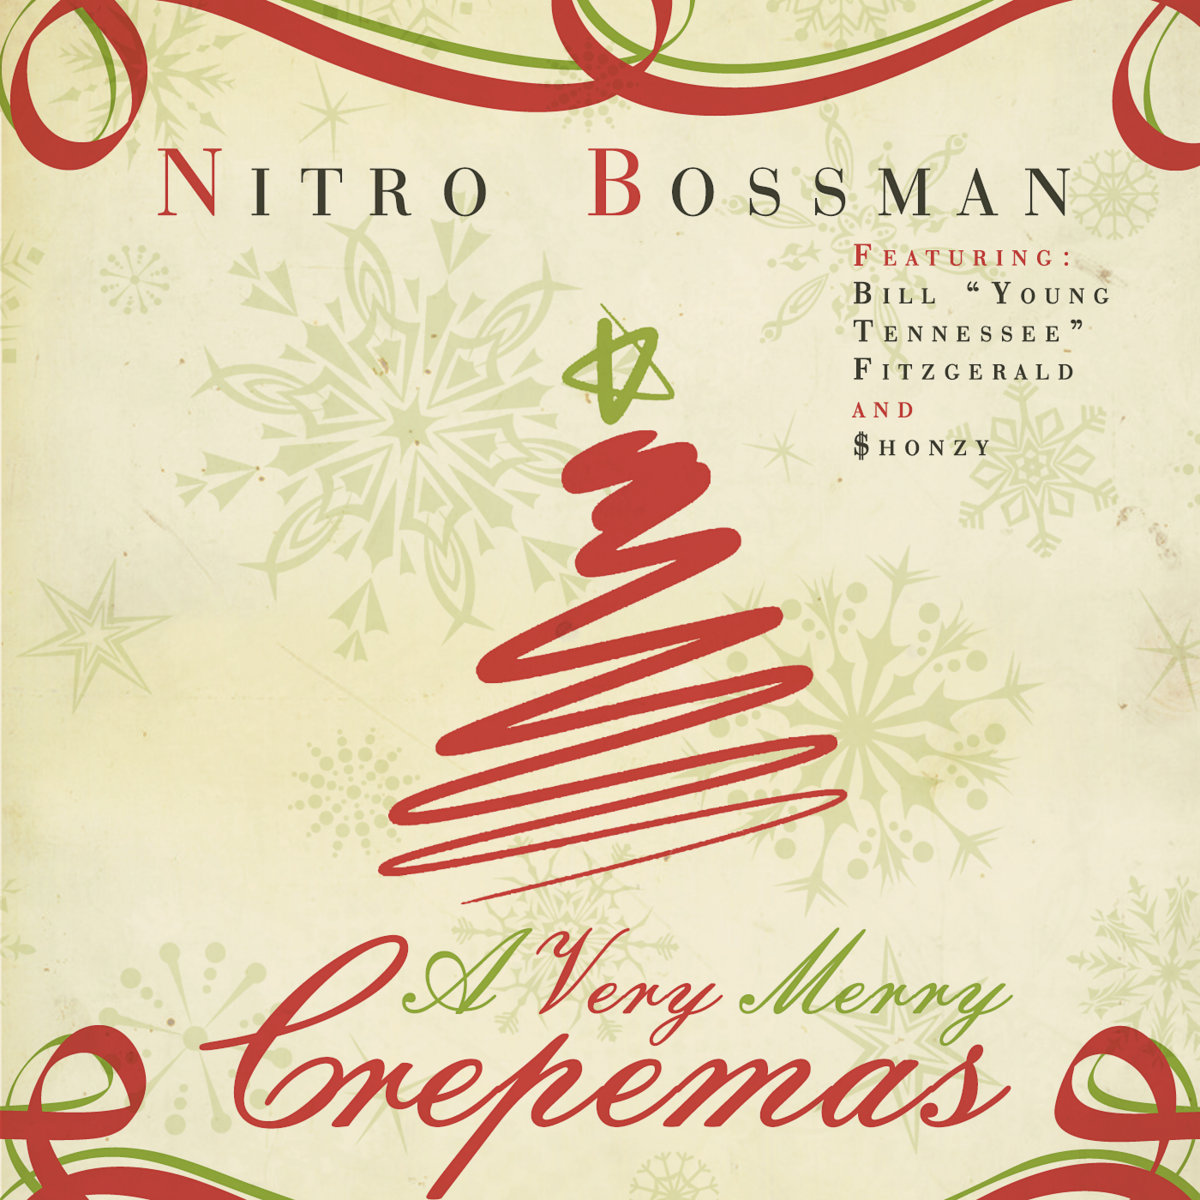 Christmas in New Orleans | Nitro Bossman